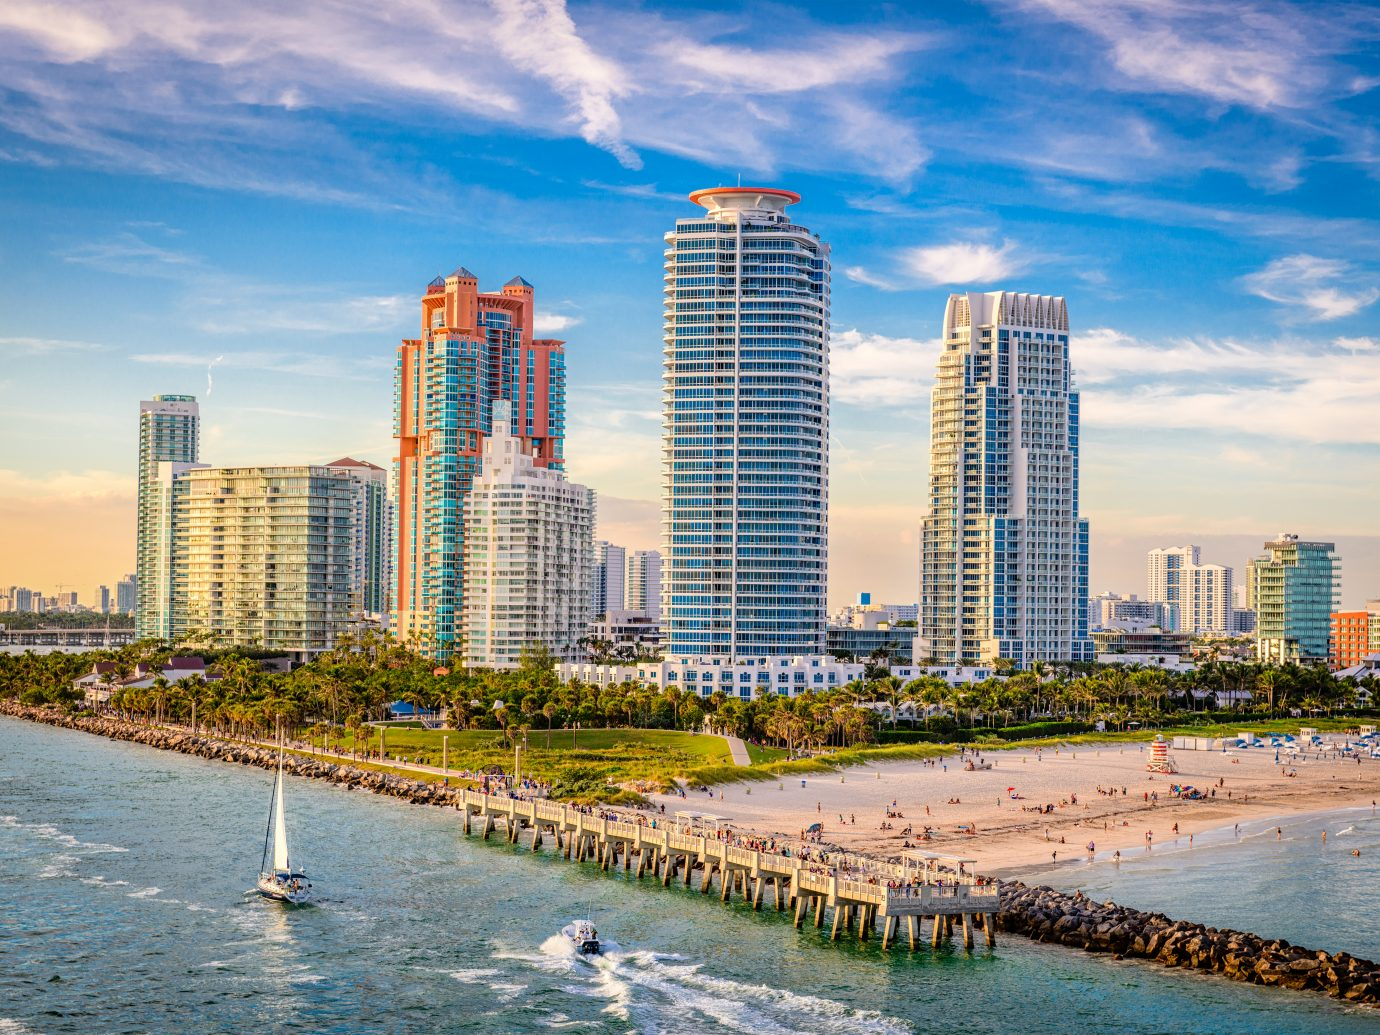 South Beach, Miami, Florida, USA over South Pointe Park.